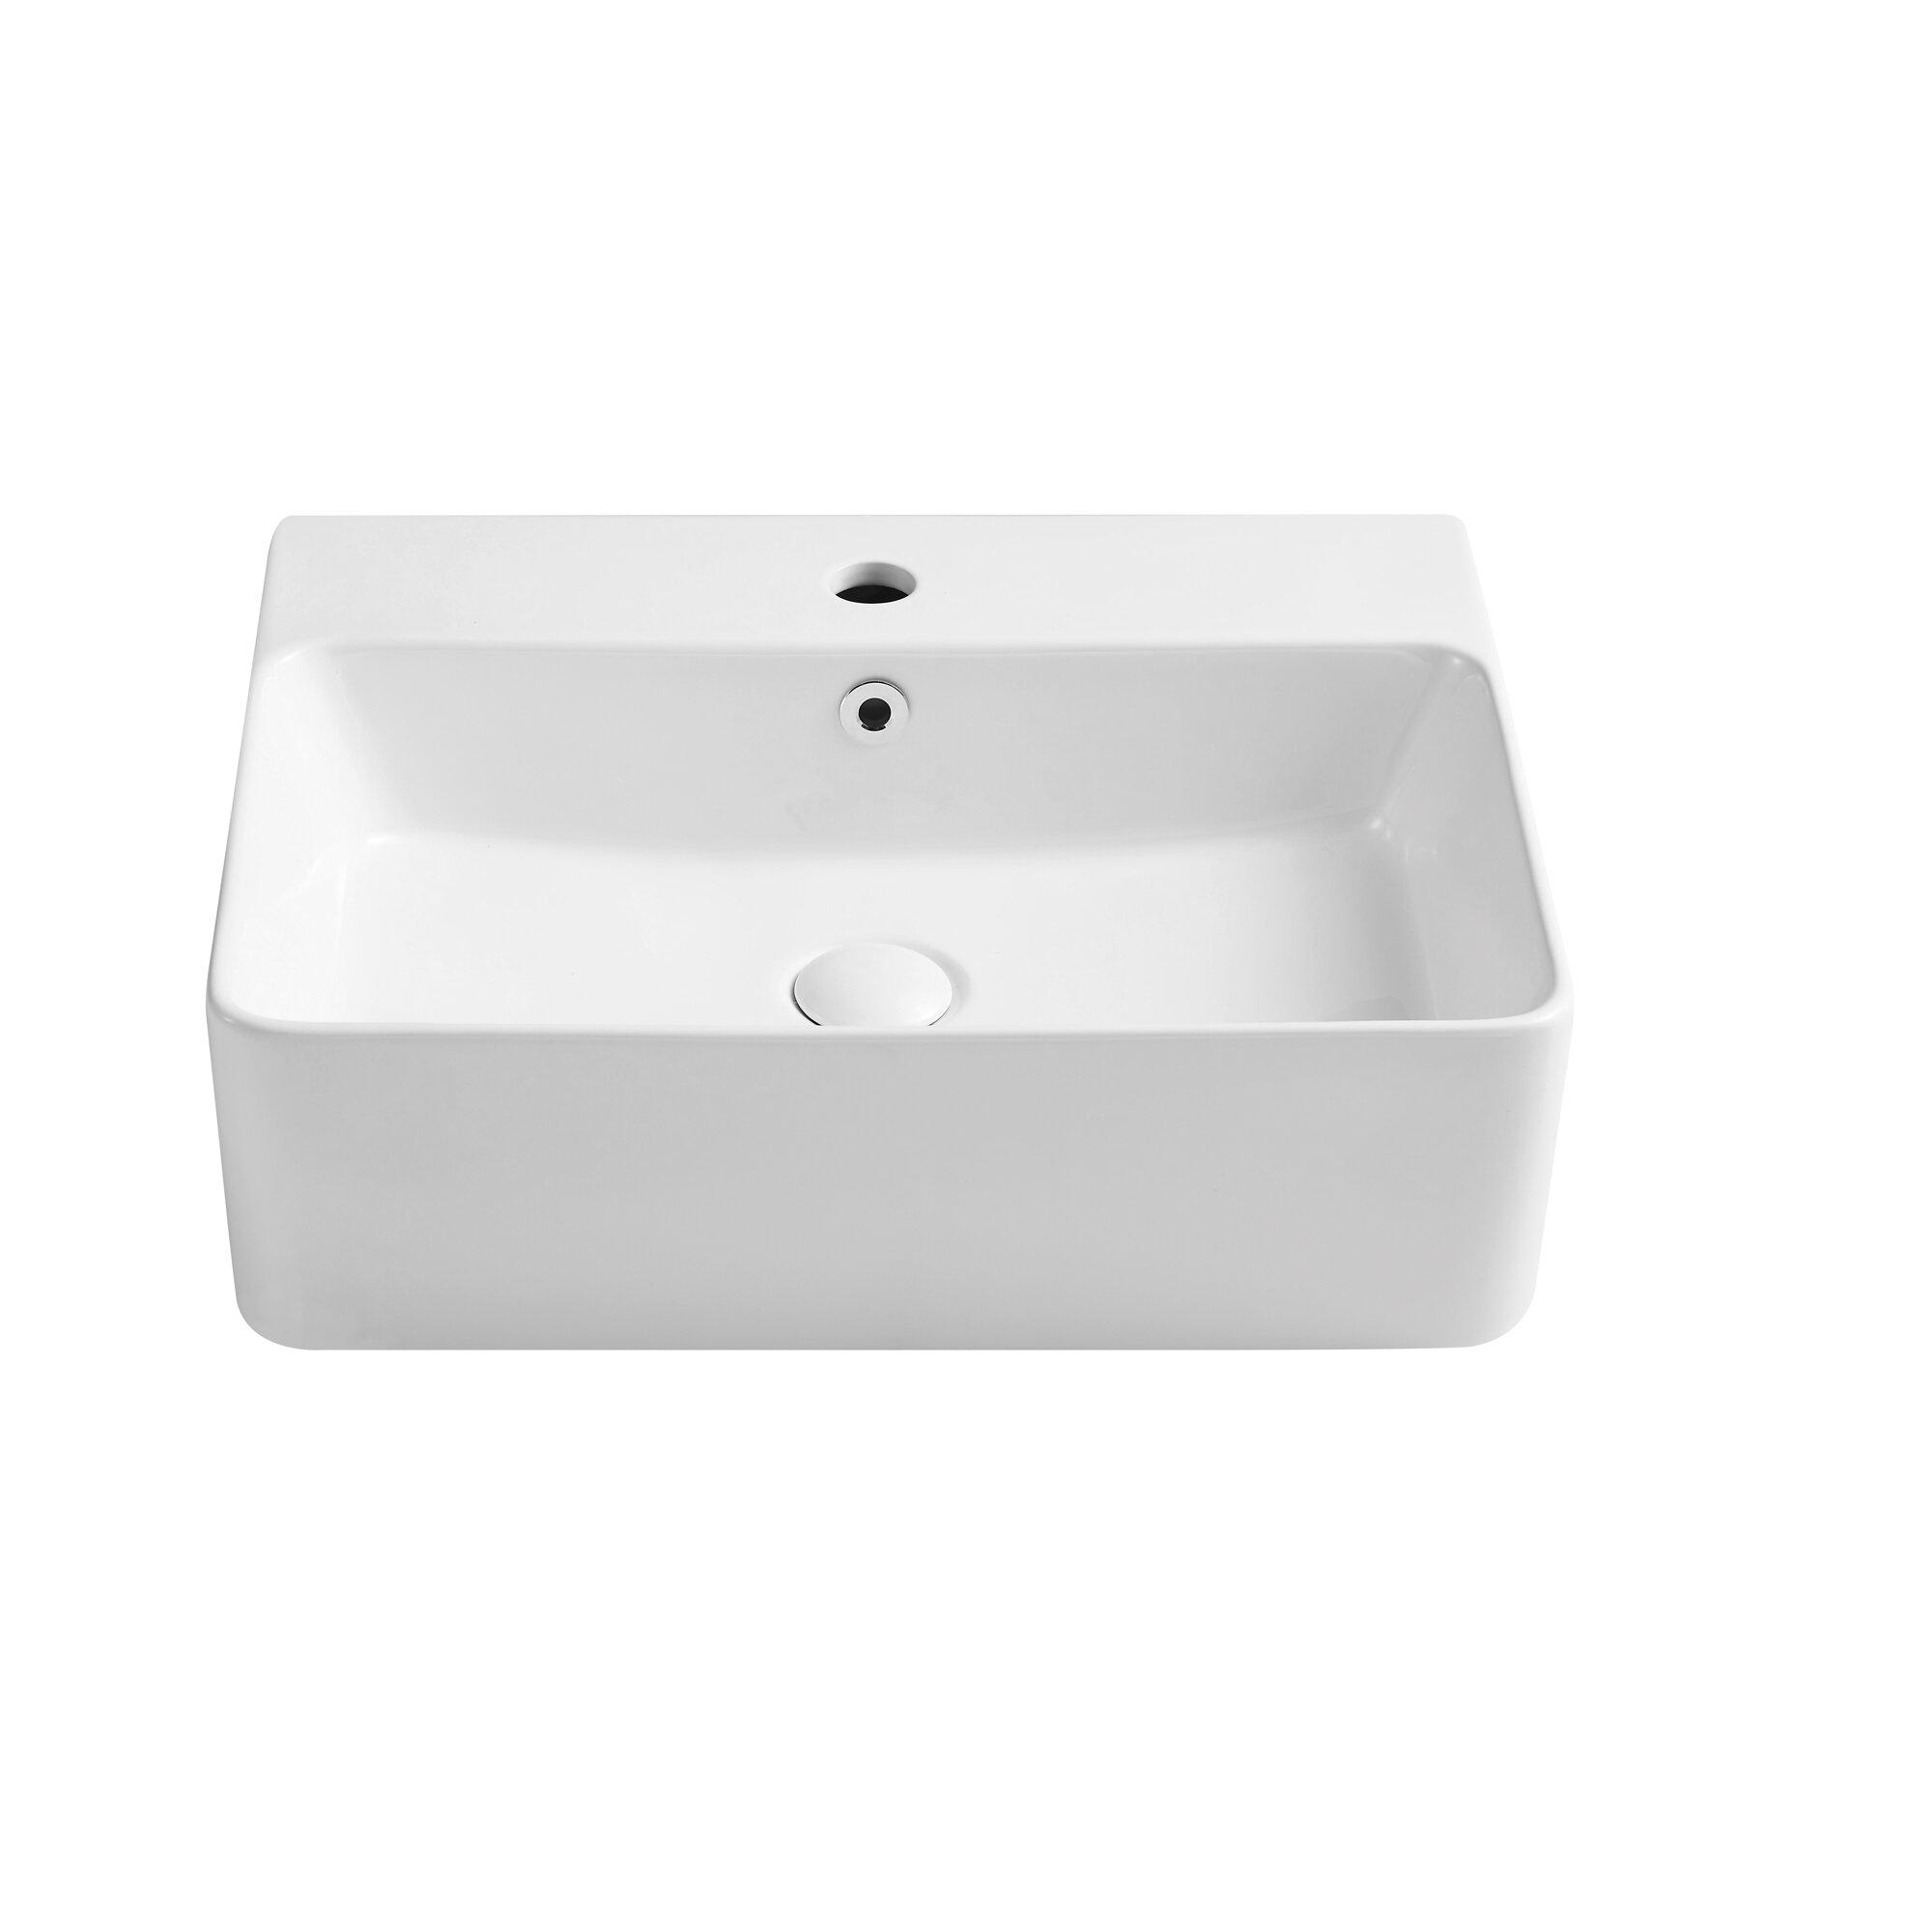 Eridanus White Ceramic Rectangular Wall Mount Bathroom Sink With Overflow Wayfair